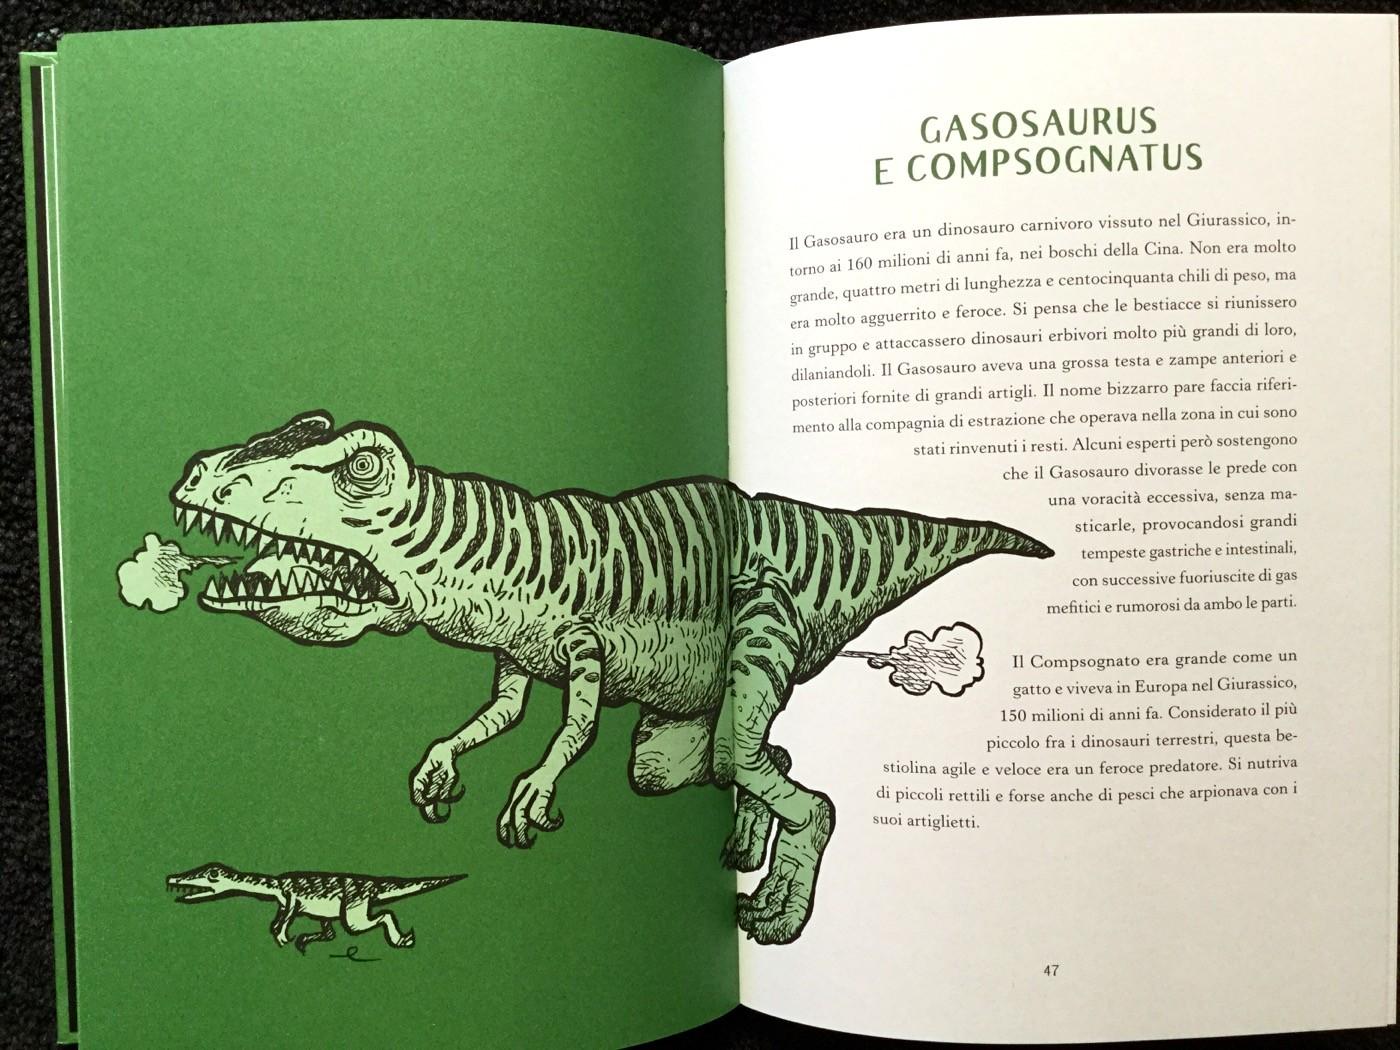 piccola_enciclopedia_dinosauri_vanna_vinci_24orecultura_galline_volanti